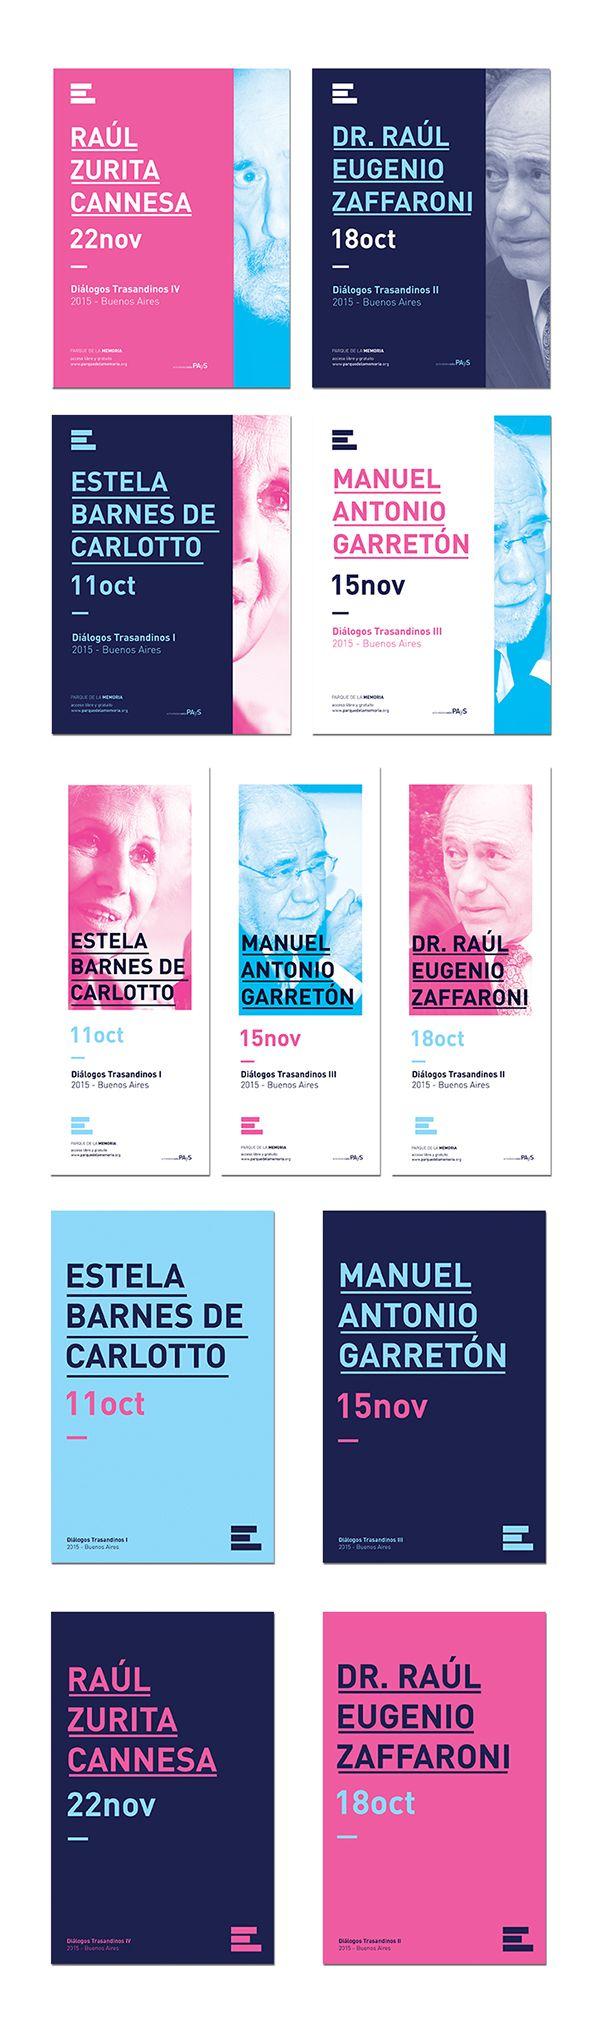 Diálogos Trasandinos 2015 on Branding Served